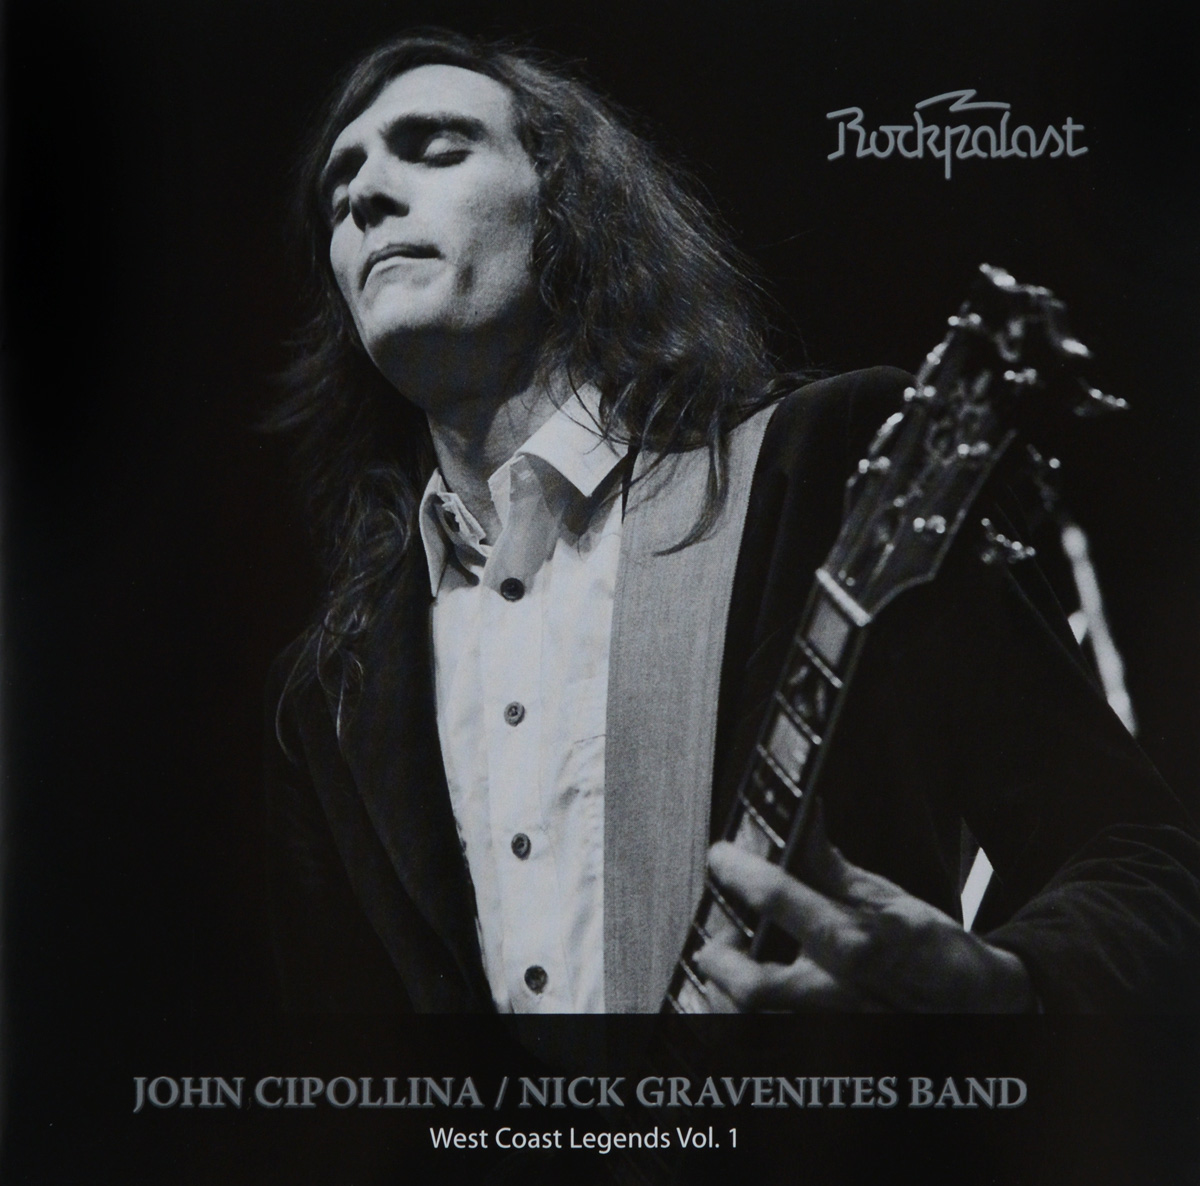 Джон Чиполлина,Nick Gravenites Band Rockpalast. John Cipollina. Nick Gravenites Band. West Coast Legends. Vol. 1 bedard tony dcu legends vol 02